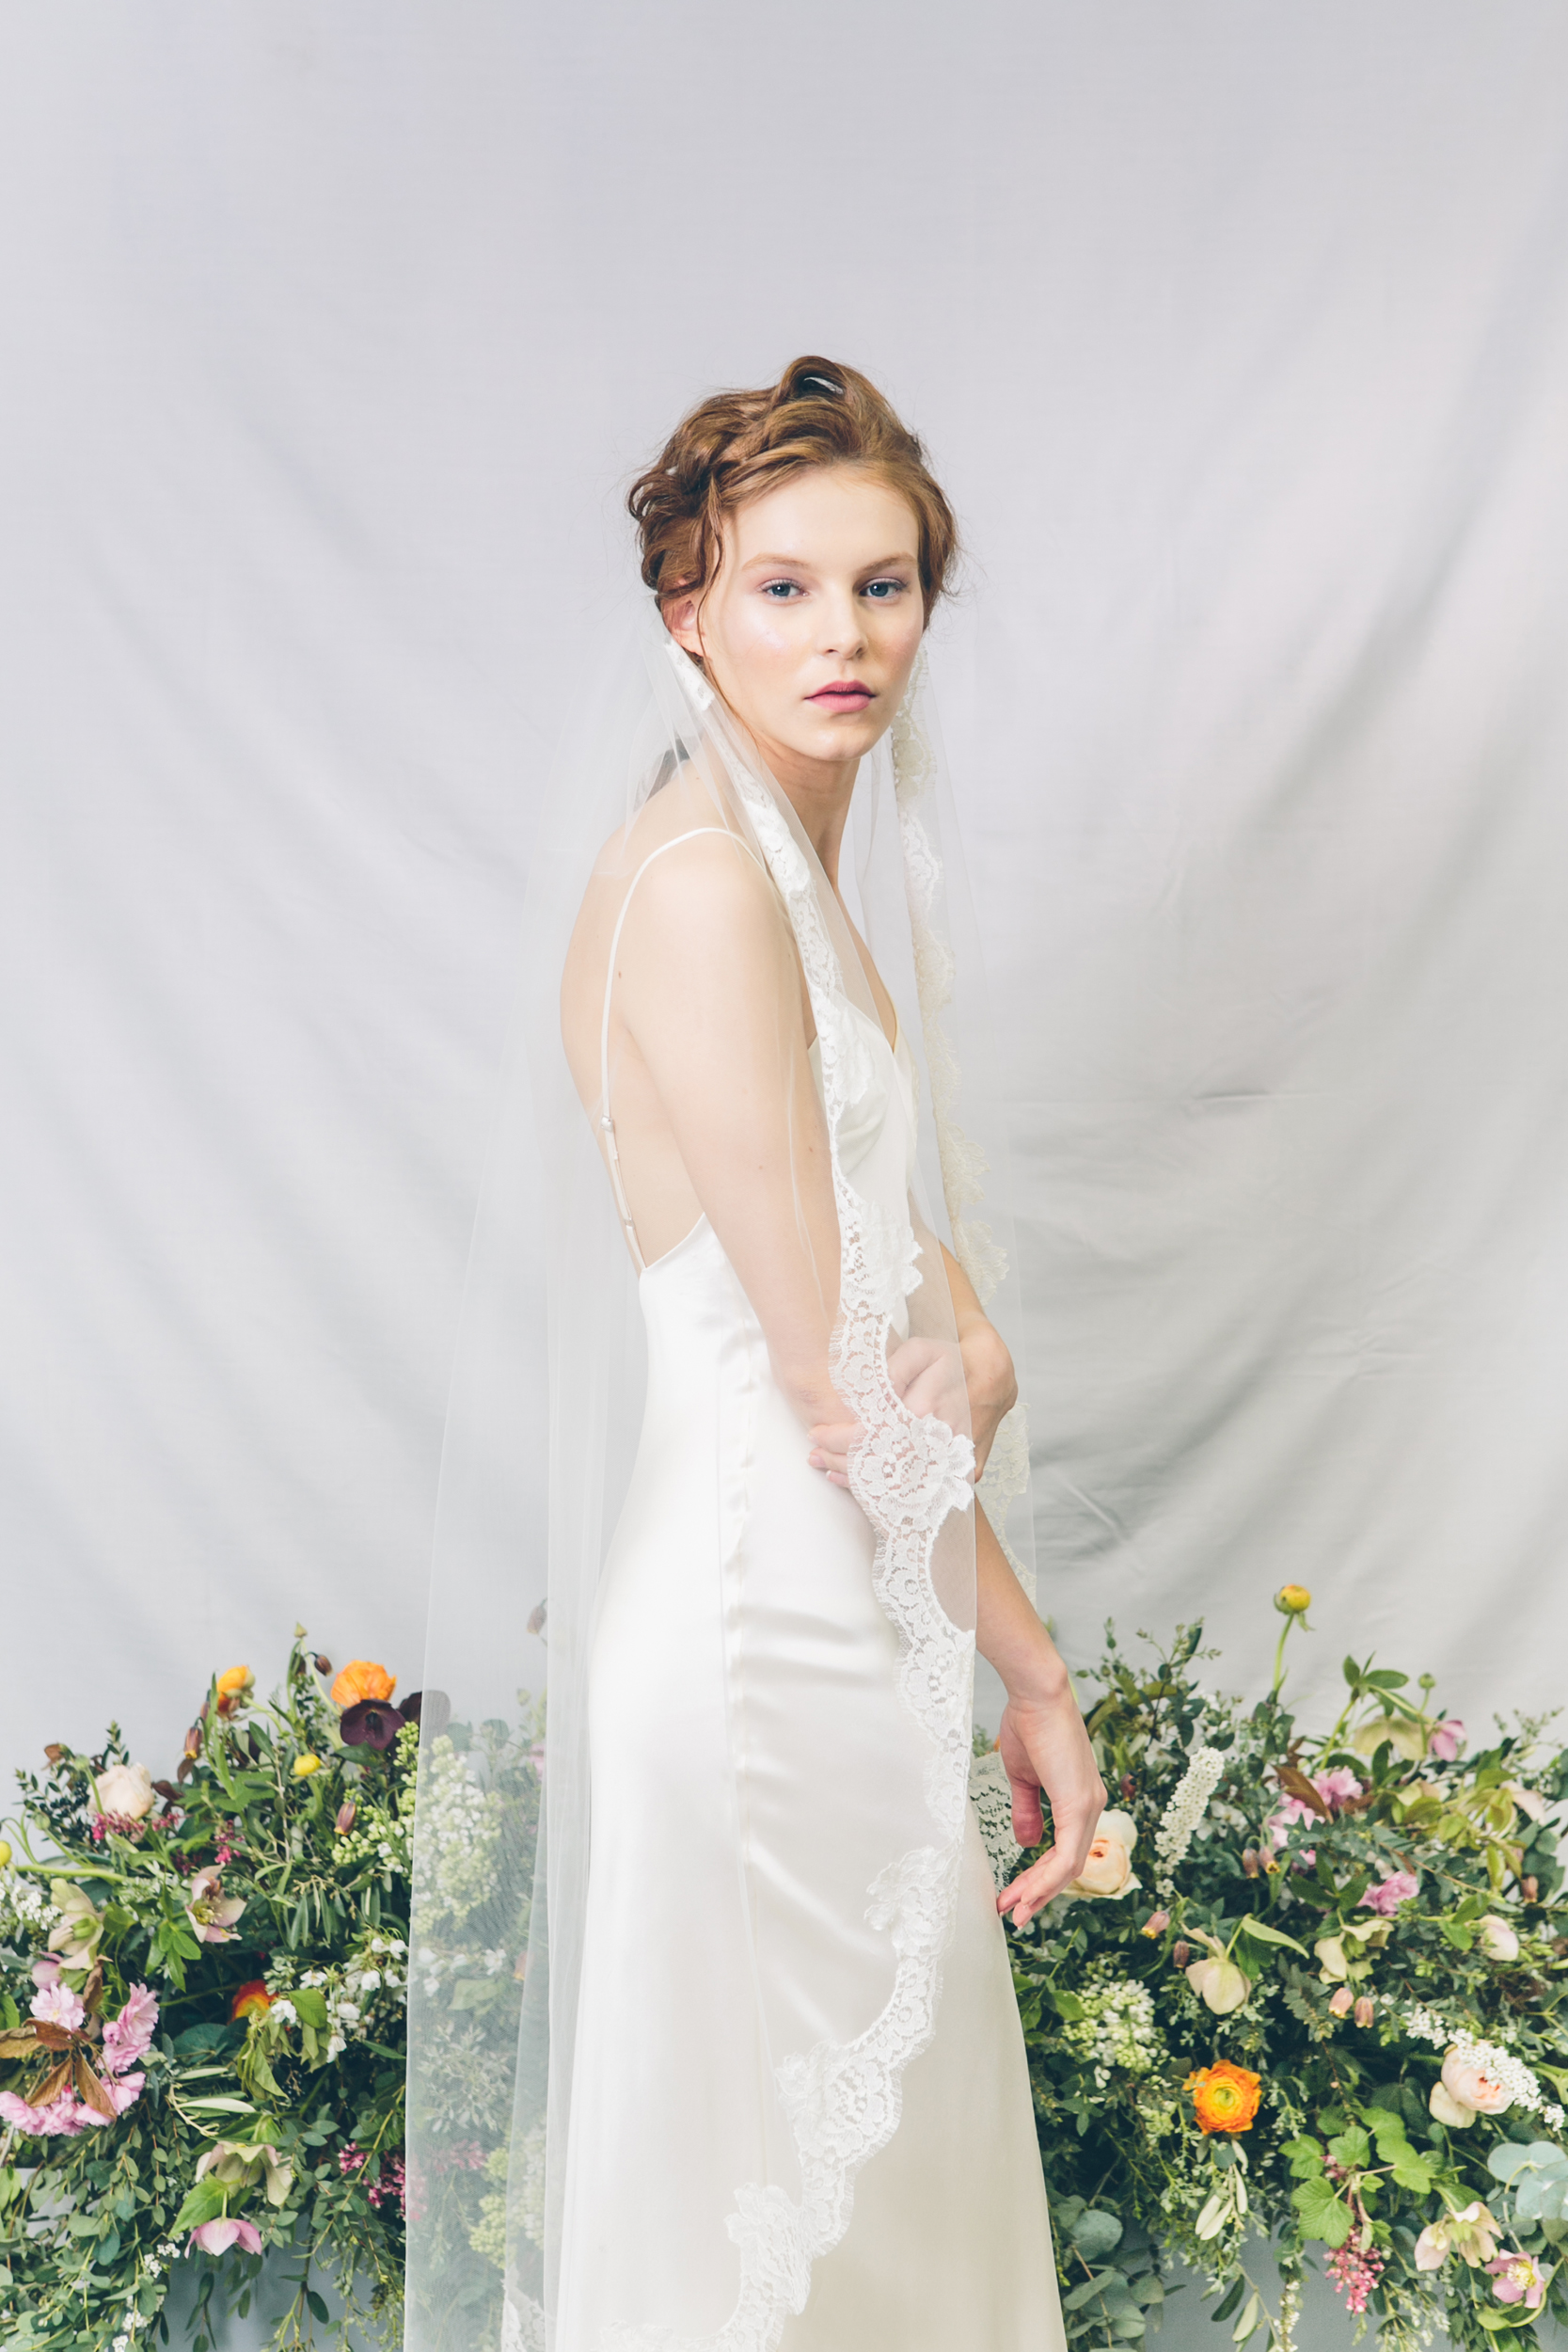 Kate-Beaumont-Wedding-Dresses-Sheffield-58.jpg